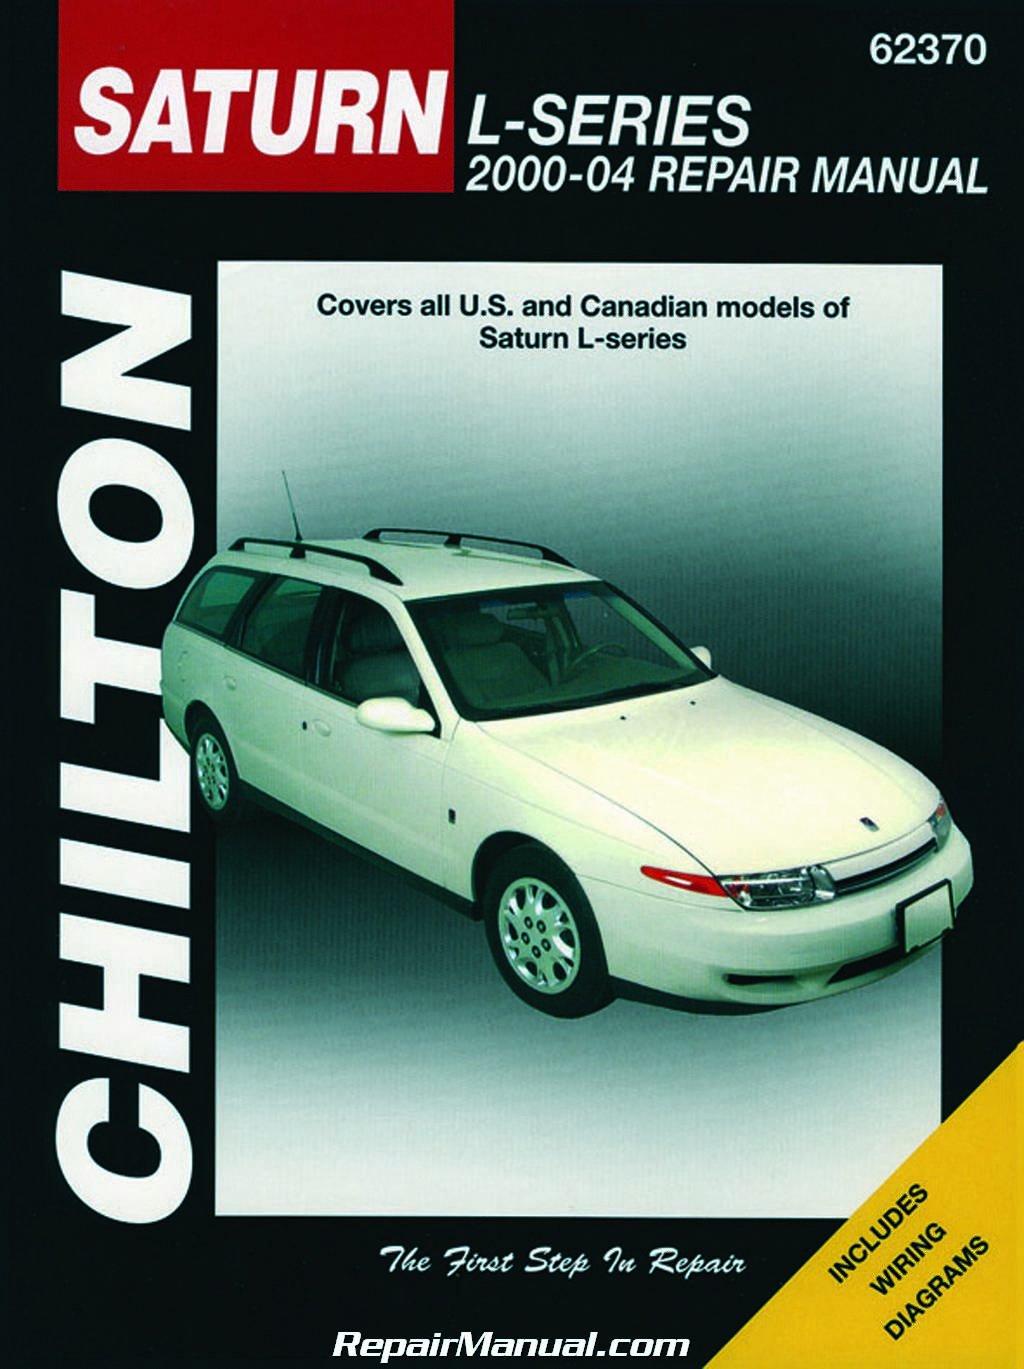 CH62370 Chilton Saturn L-Series 2000-2004 Repair Manual: Manufacturer:  Amazon.com: Books